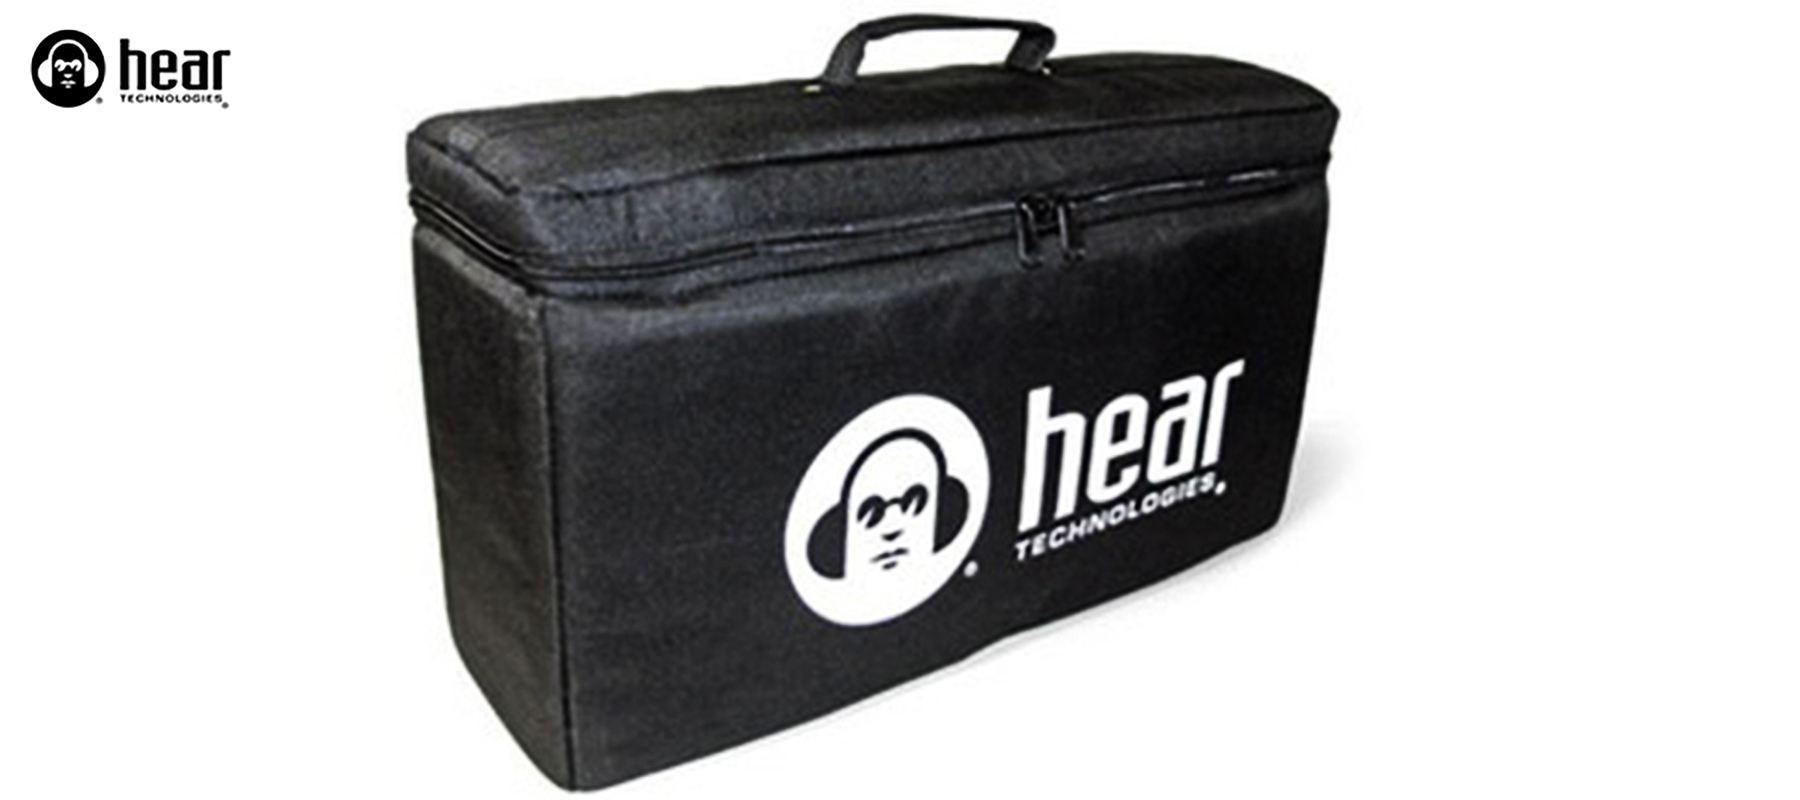 Hear Technologies Tote Bag